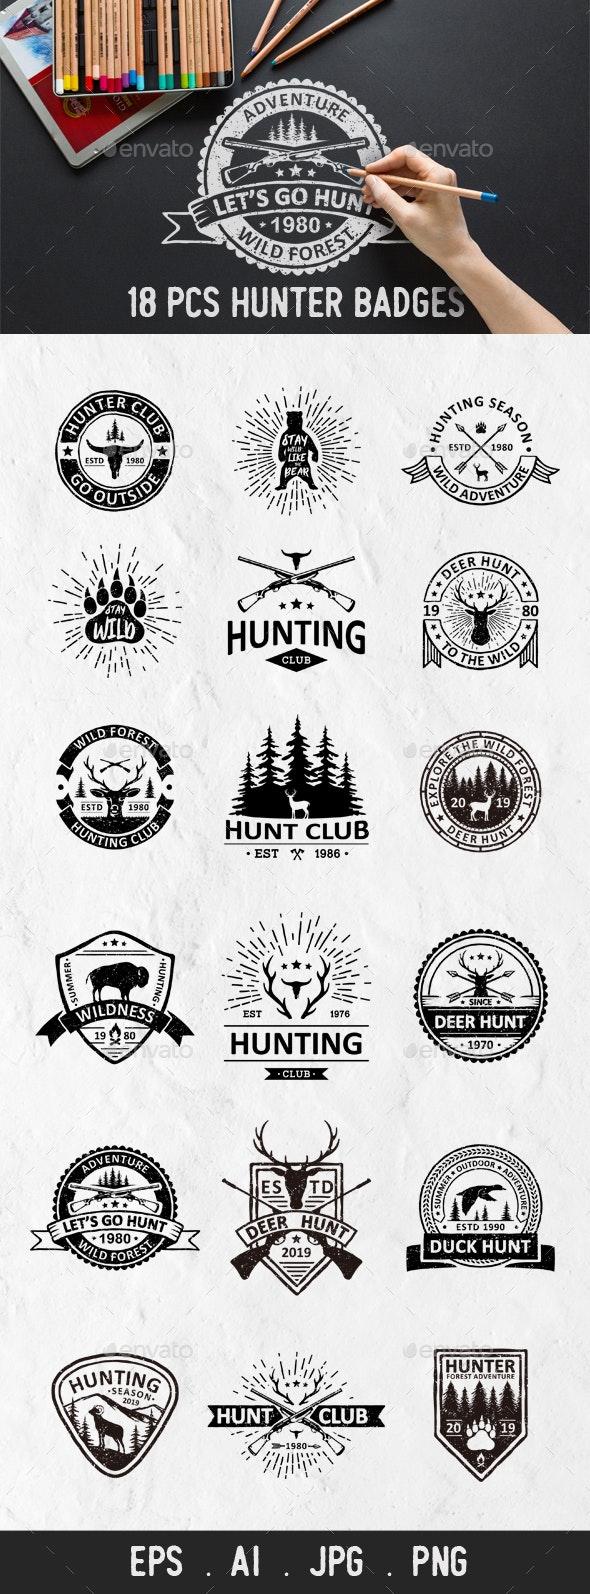 18 Hunter Badges and Logos - Animals Characters